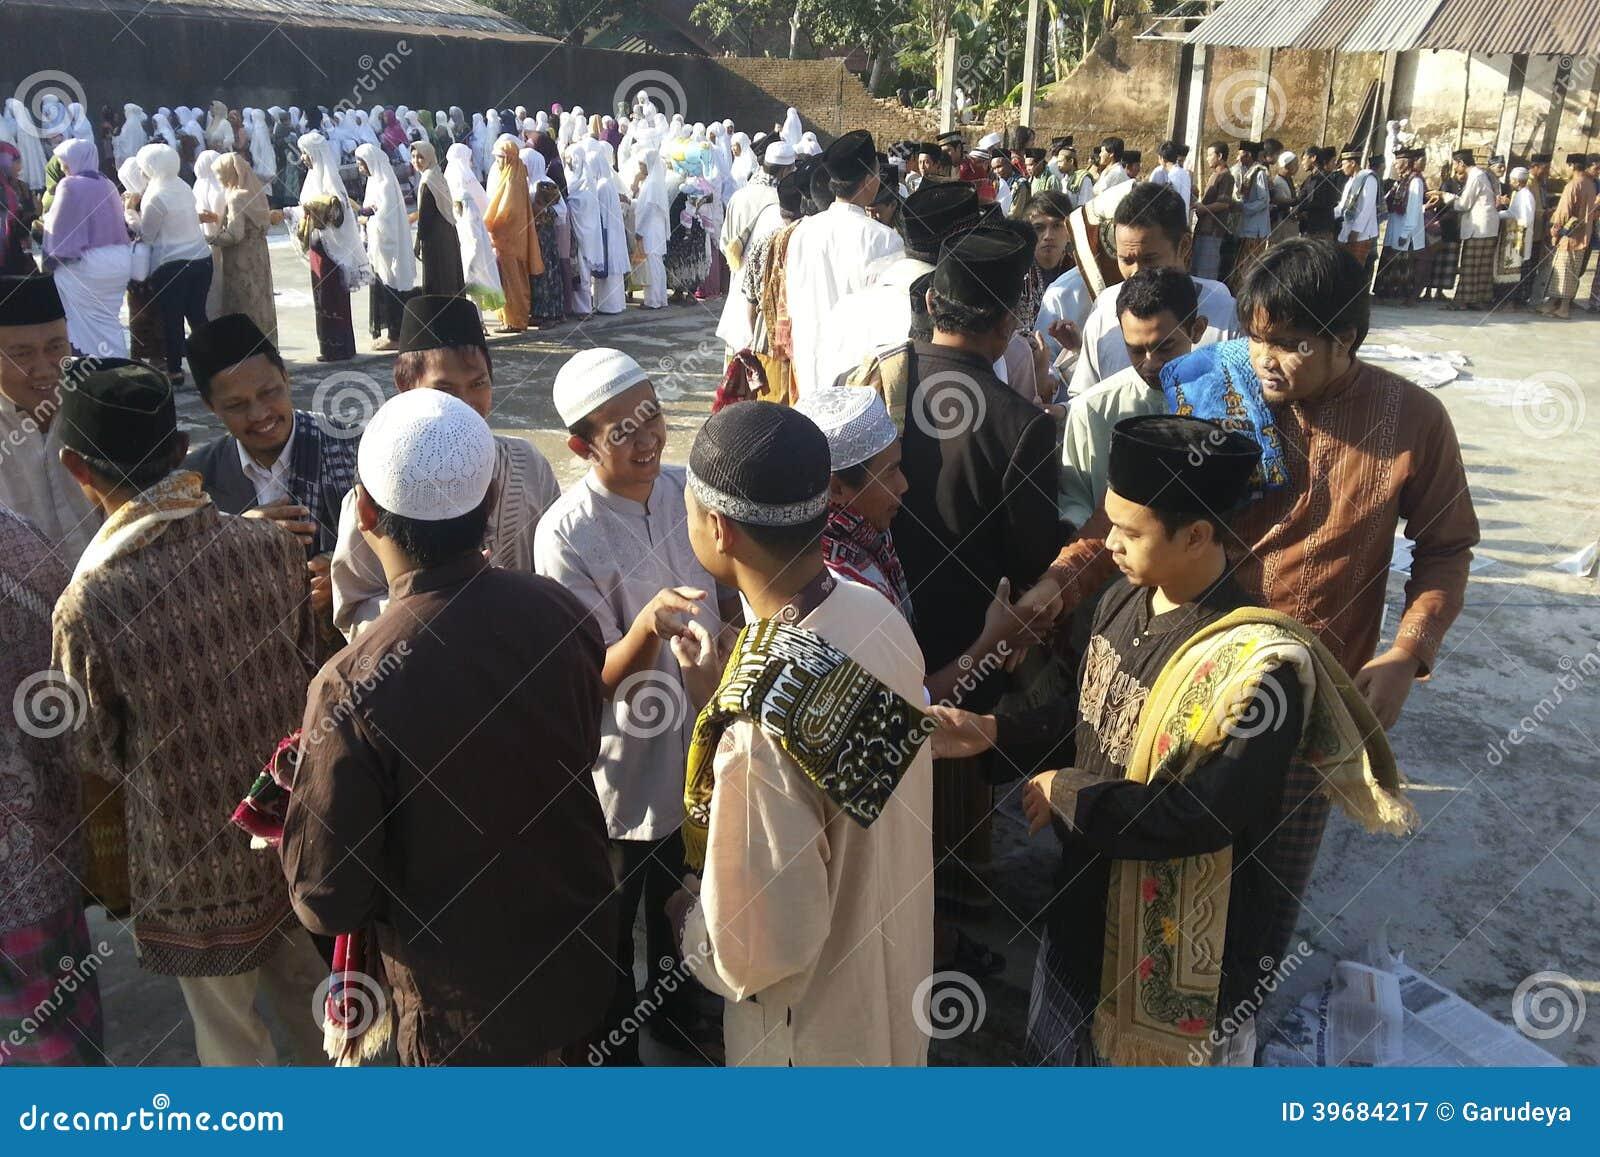 ISLAM IN INDONESIA